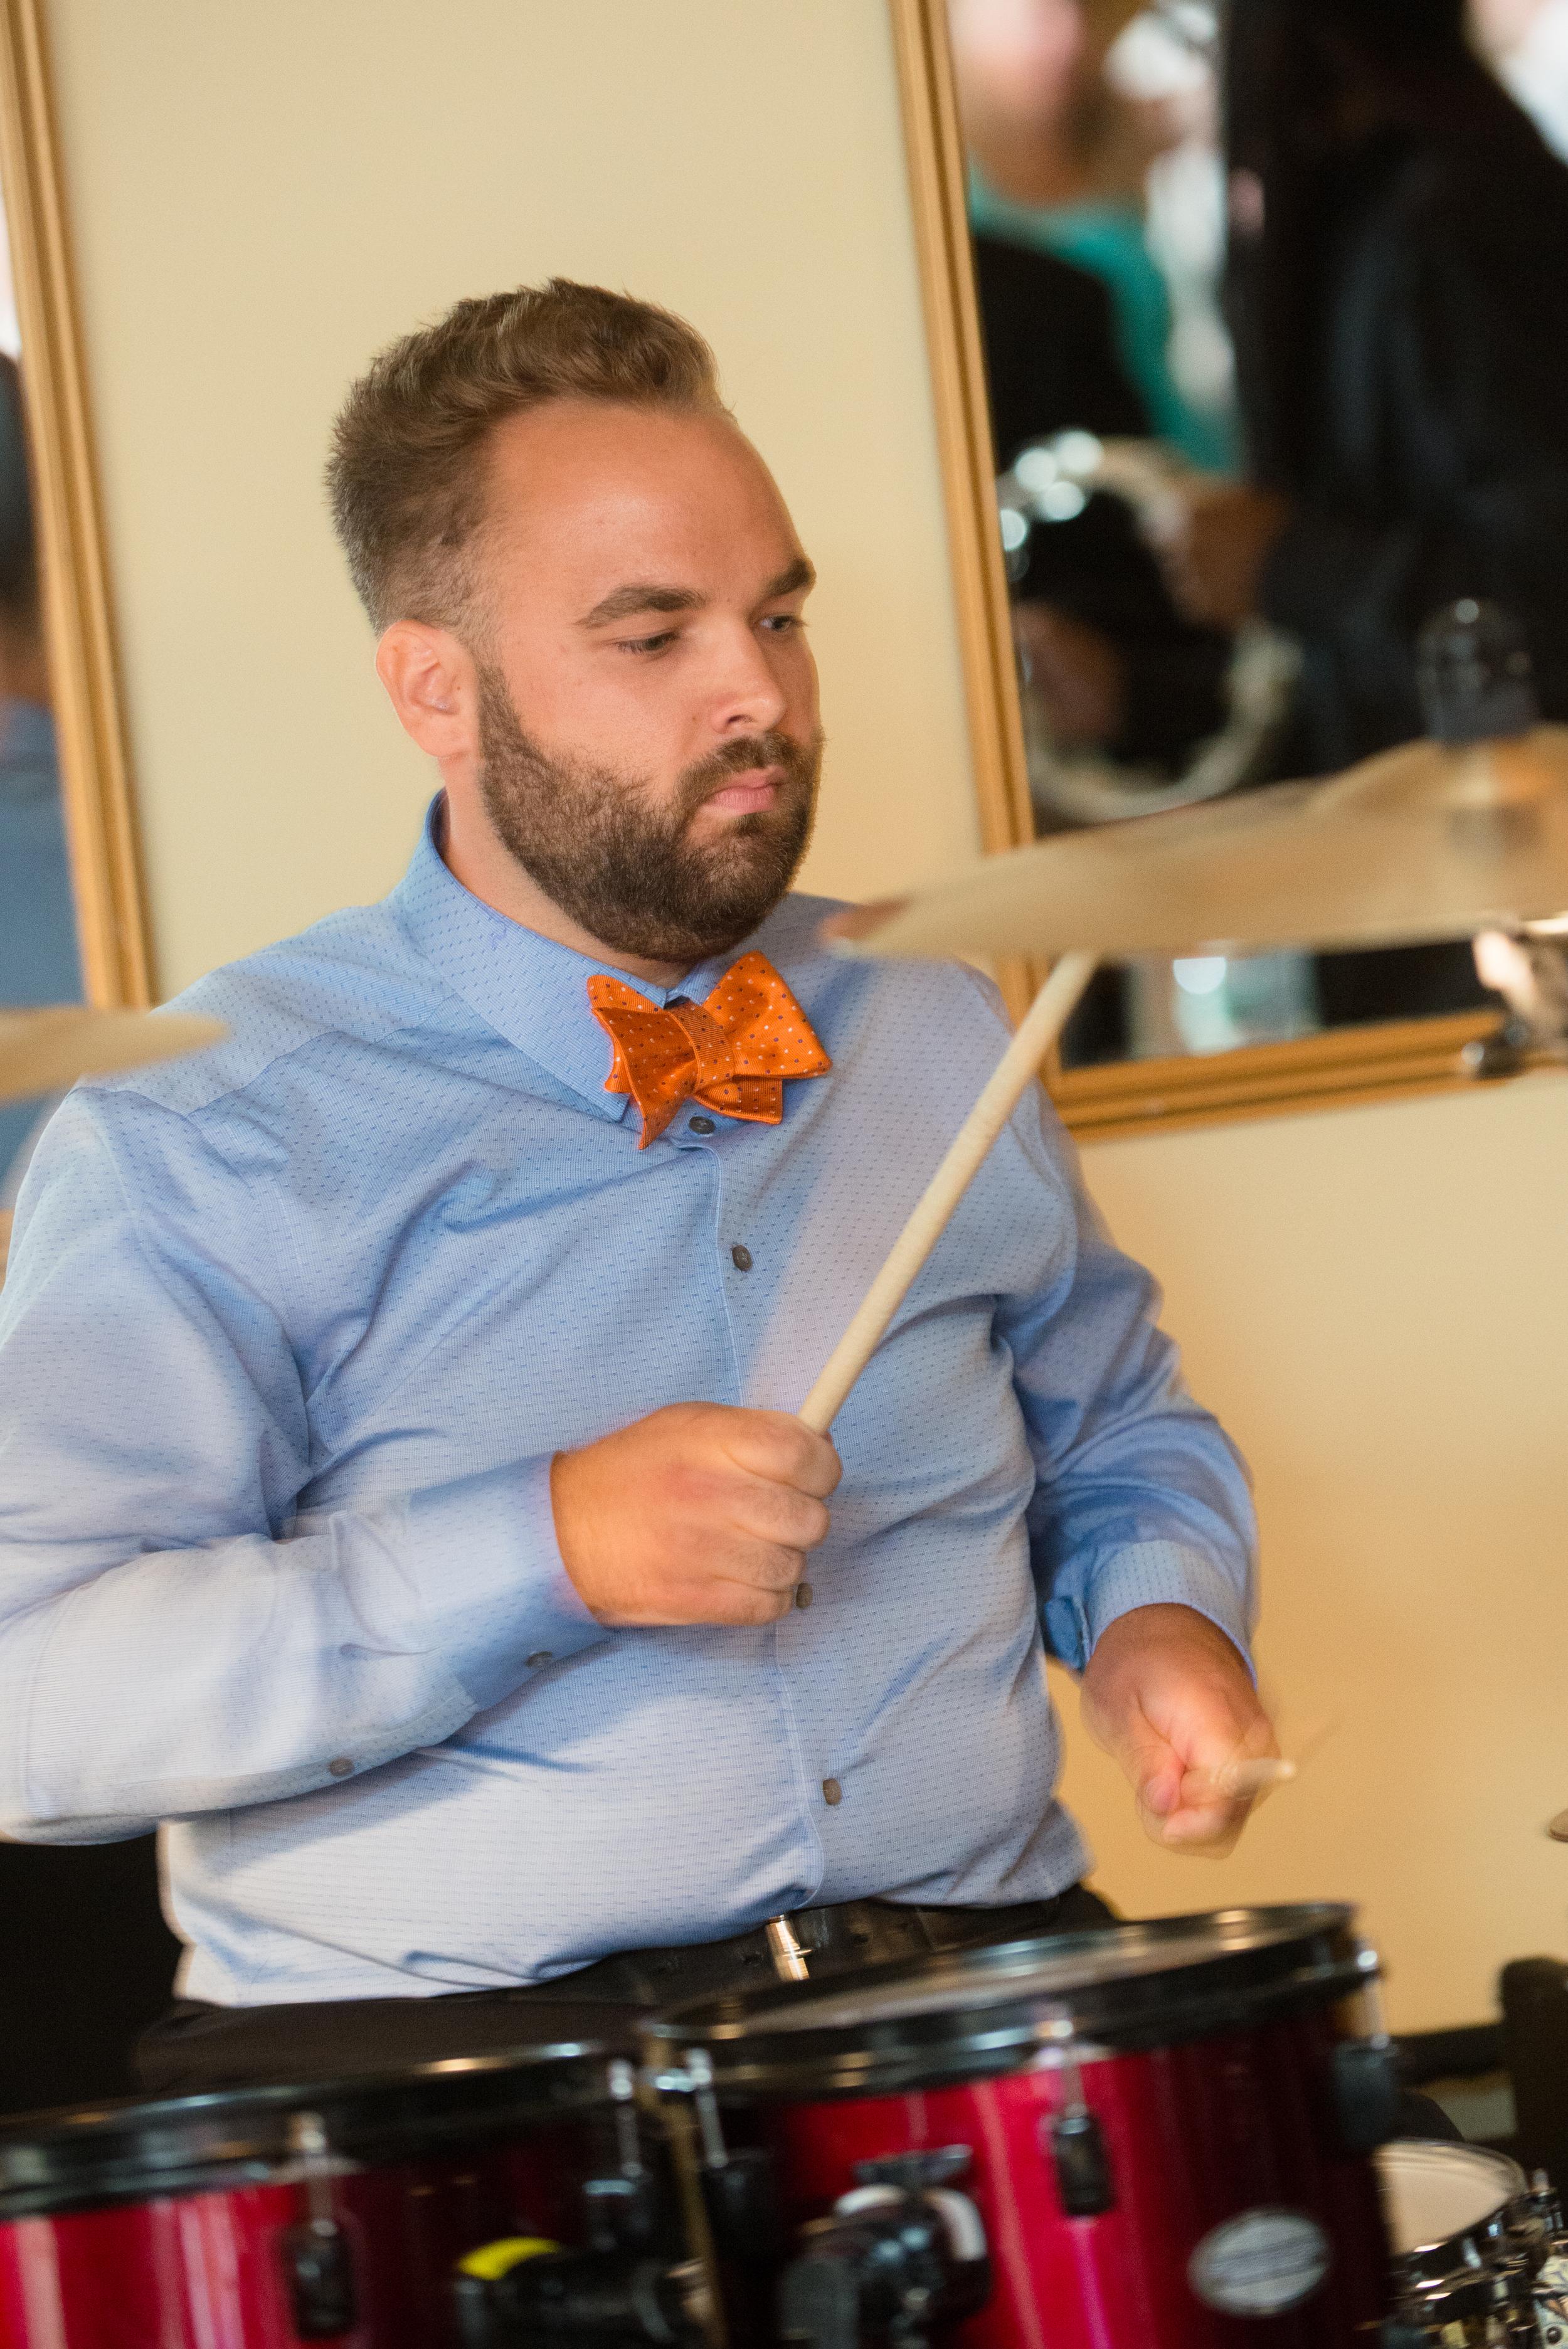 Playing drum set at Danny Merrigan's wedding.